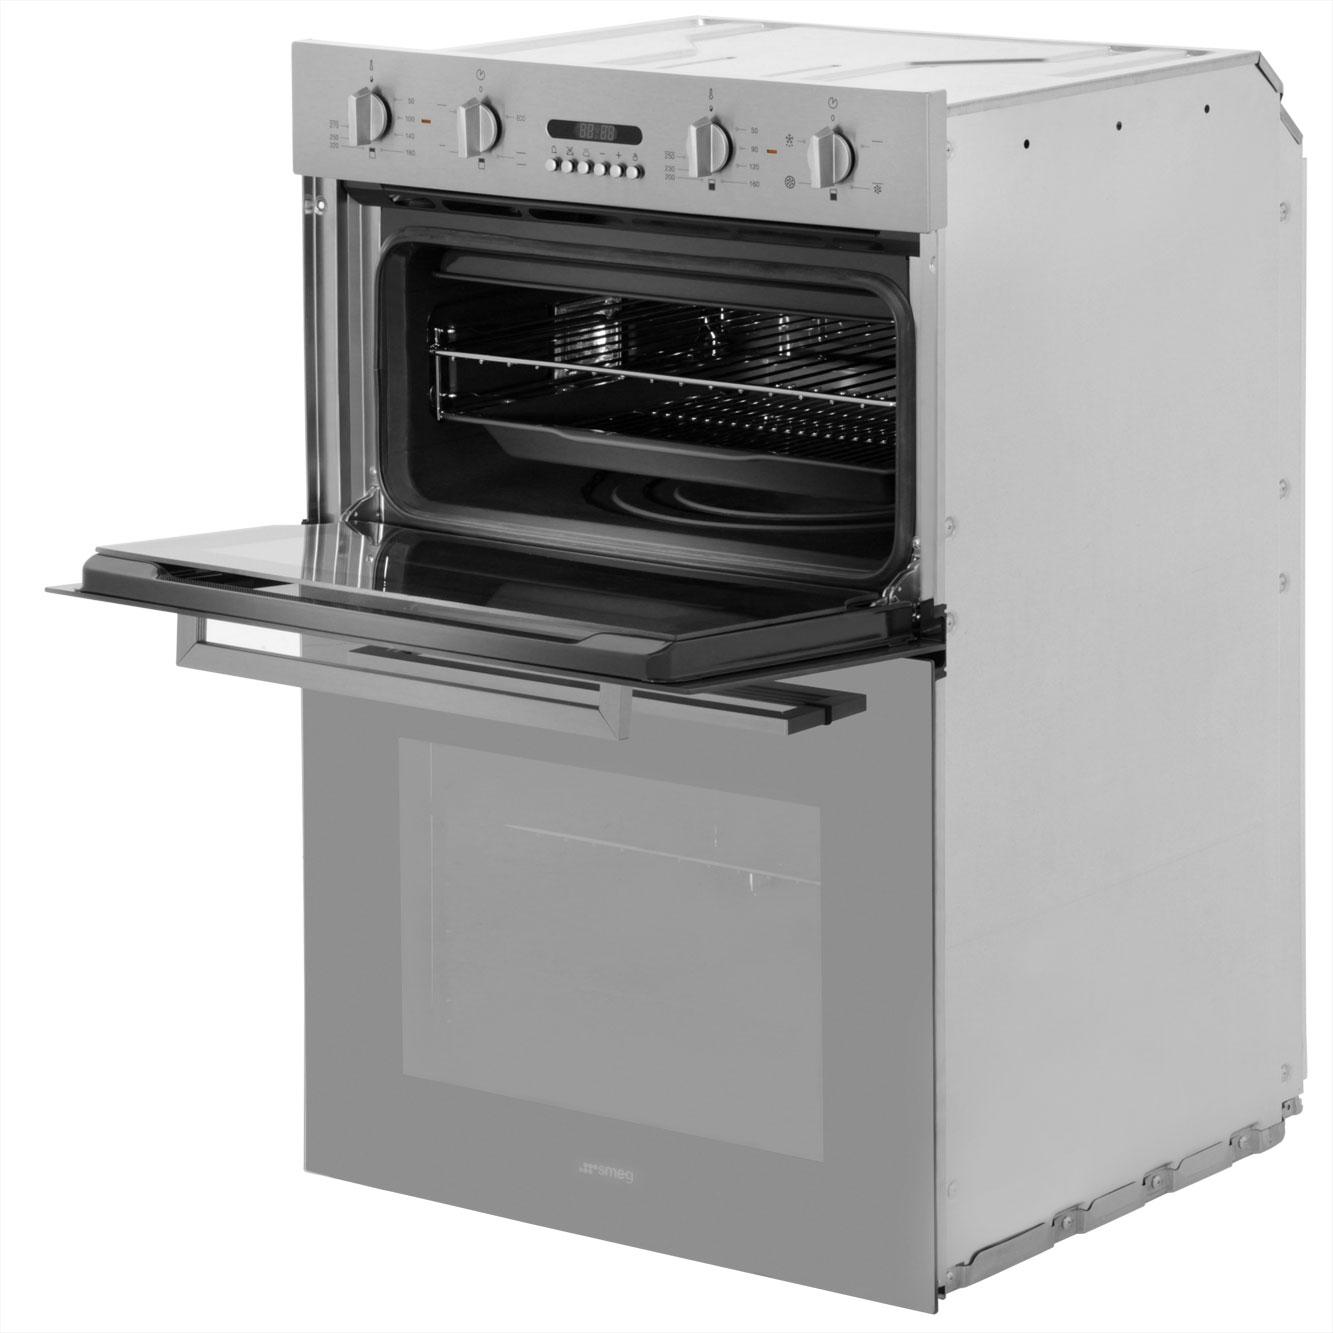 DOSF44X_SS | Smeg electric double oven | ao.com